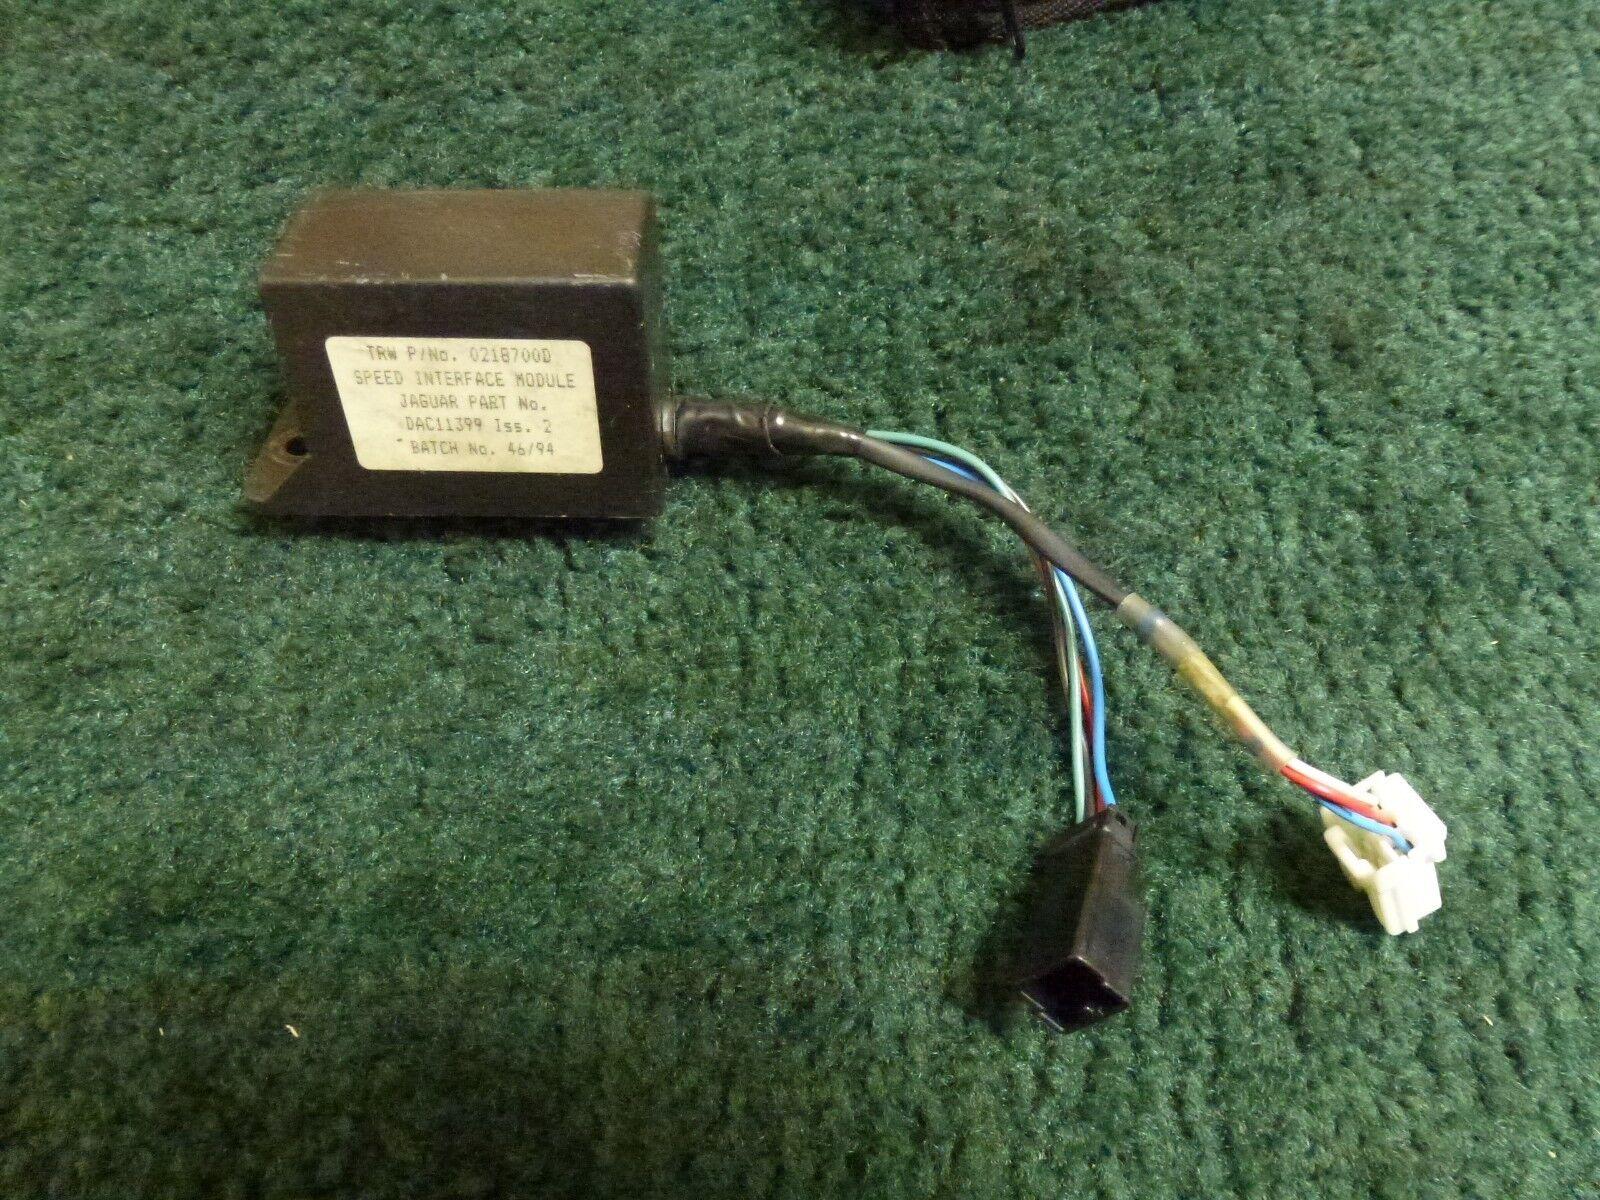 Used Jaguar Xjs Headlights For Sale 1996 Xj6 Headlight Diagram 1994 Oem Convertible Speed Interface Dac 11399 Module